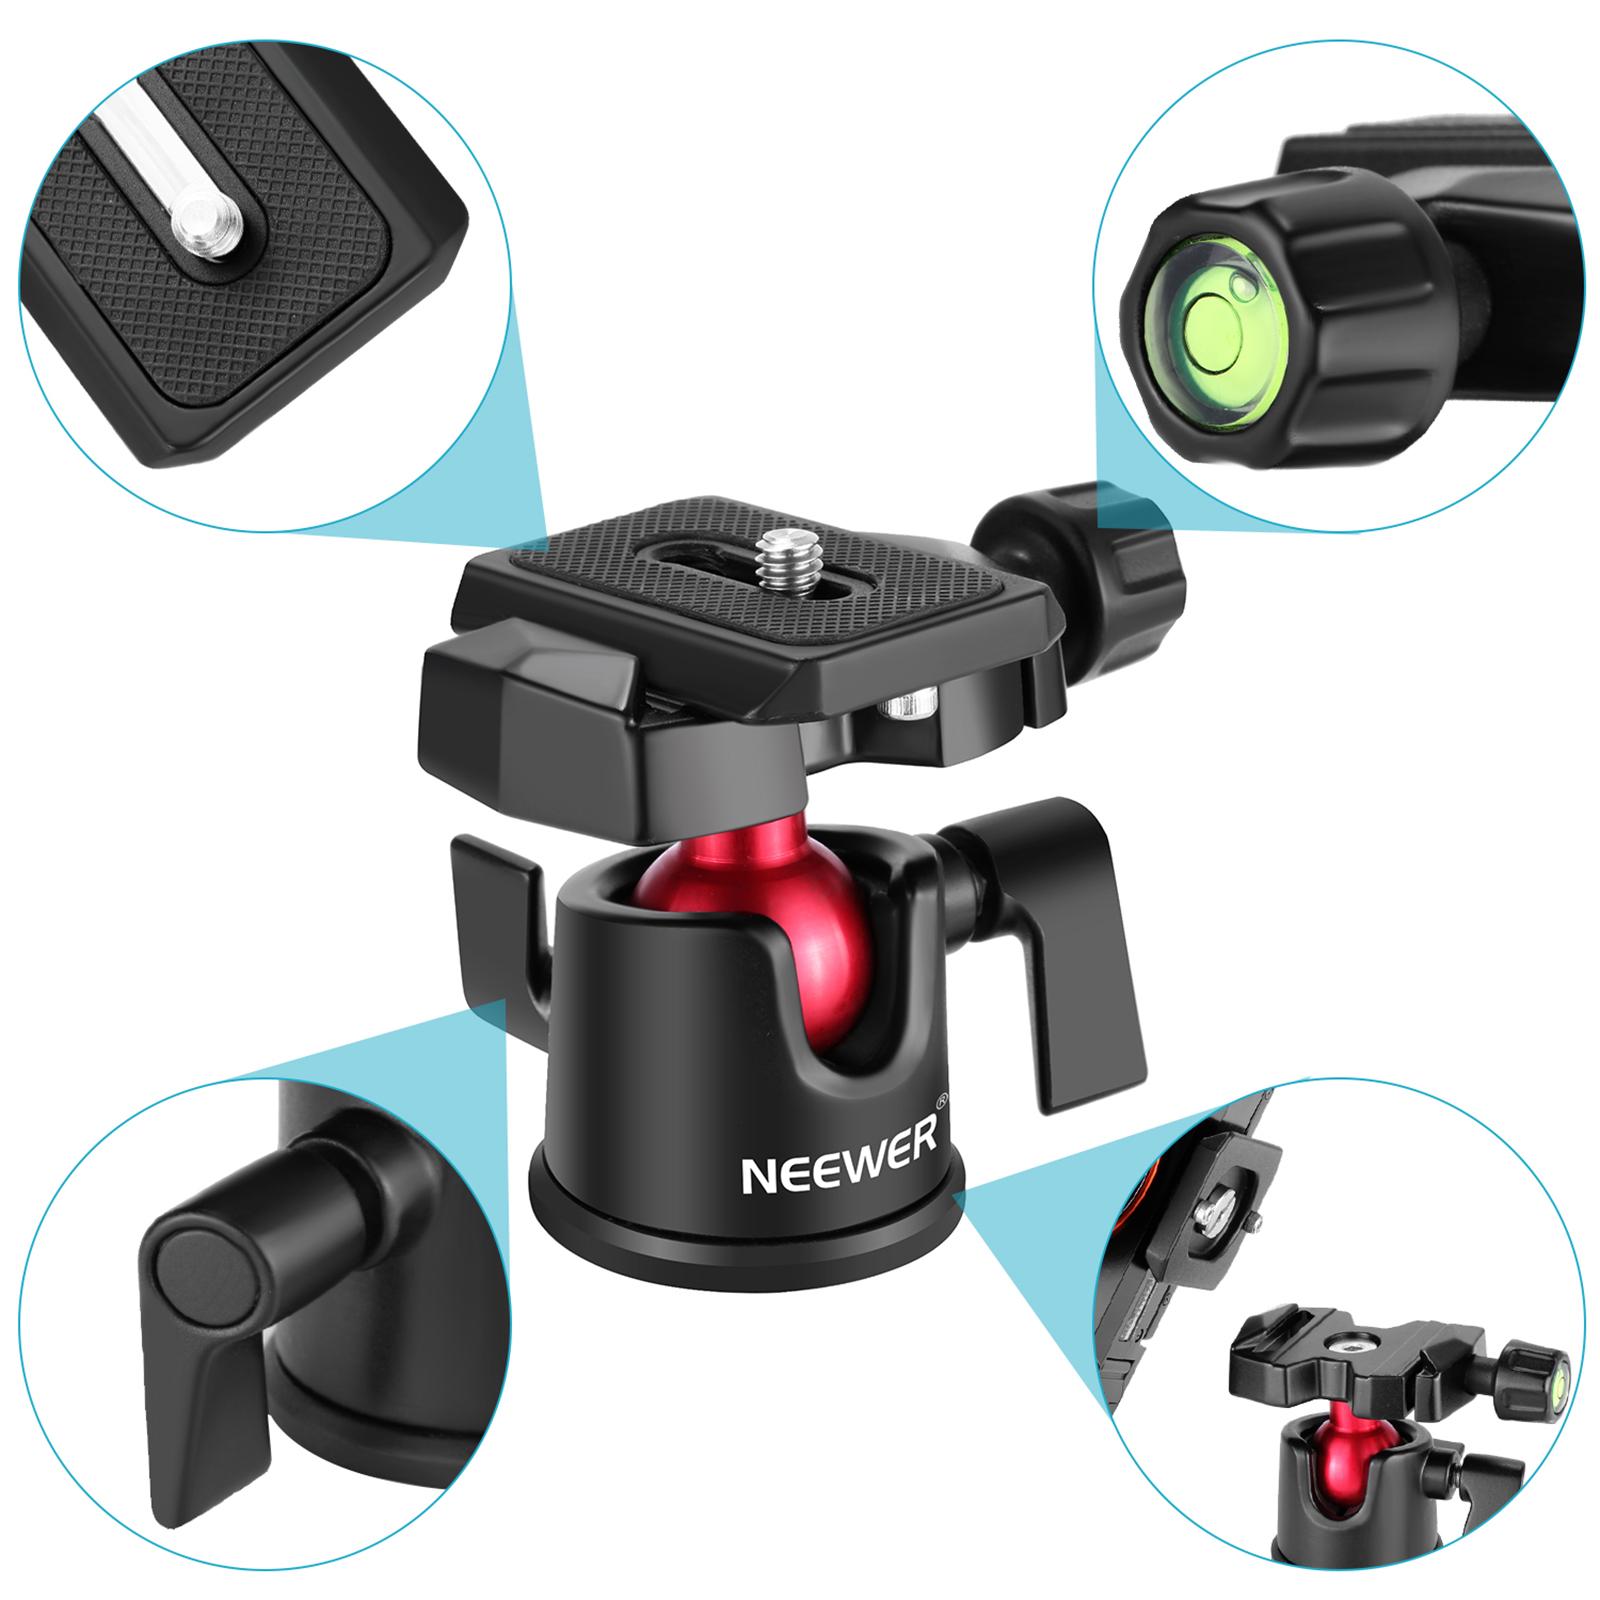 neewer tripod mini 360 176 rotating